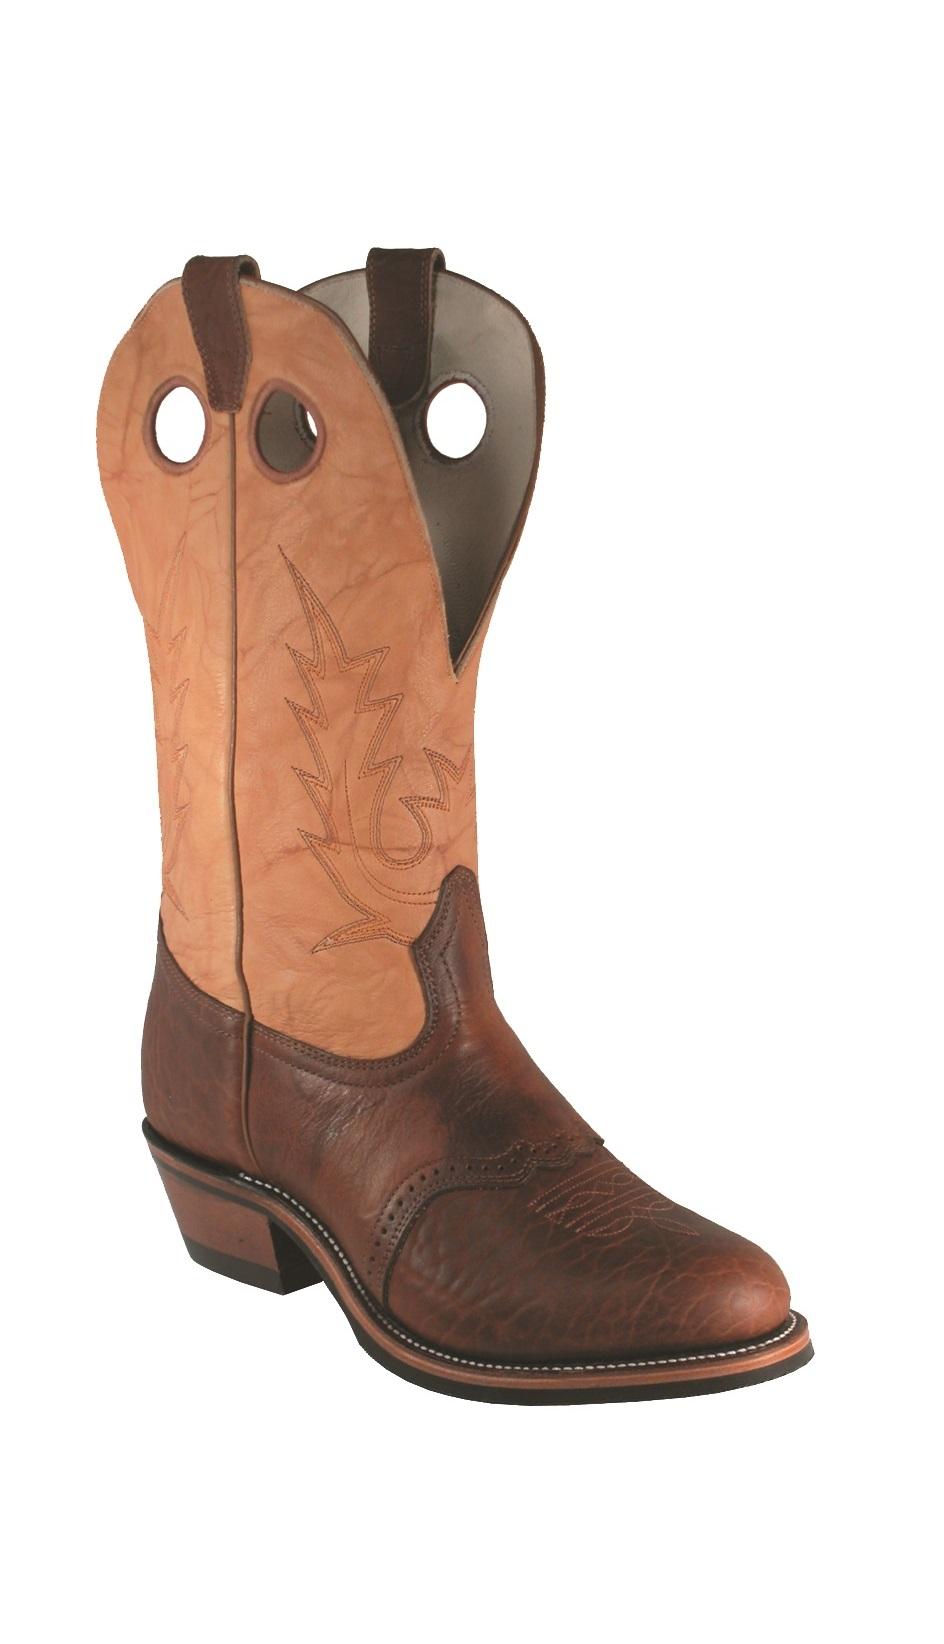 ccd11e31d7d BOULET Mens's Buckaroo Round-Toe bulls hide boots 4163